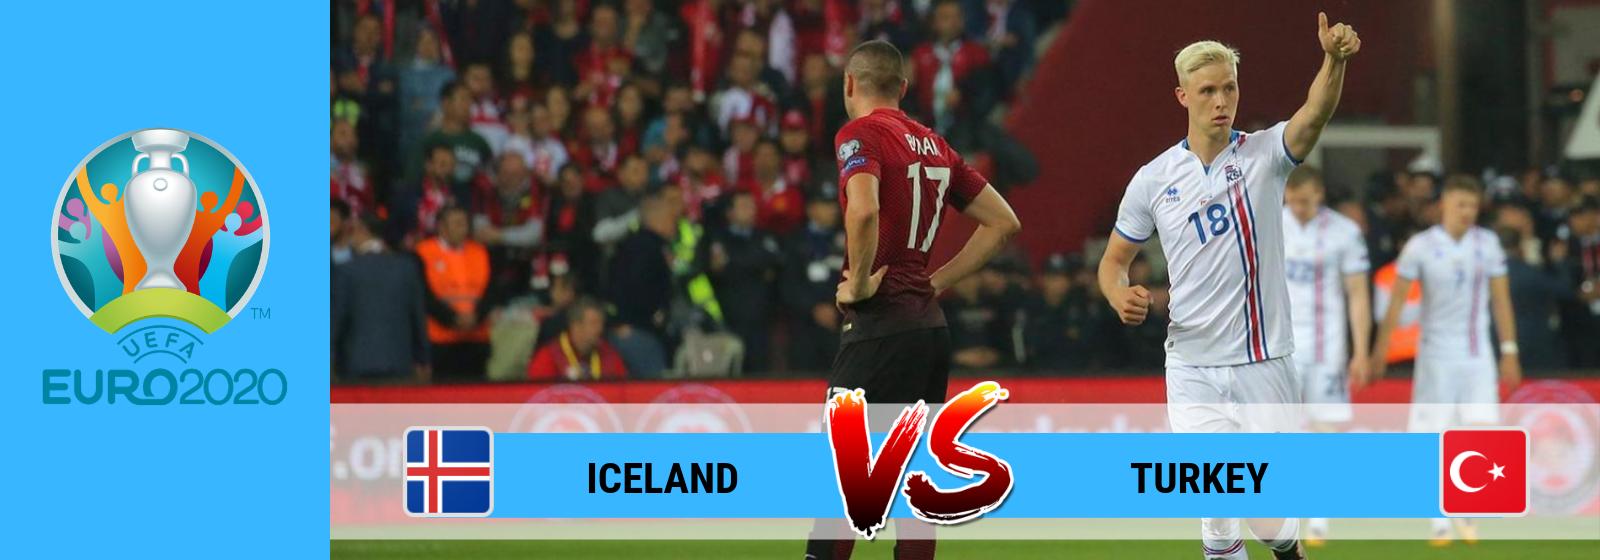 UEFA Euro 2020 Iceland Vs Turkey Asian Connect